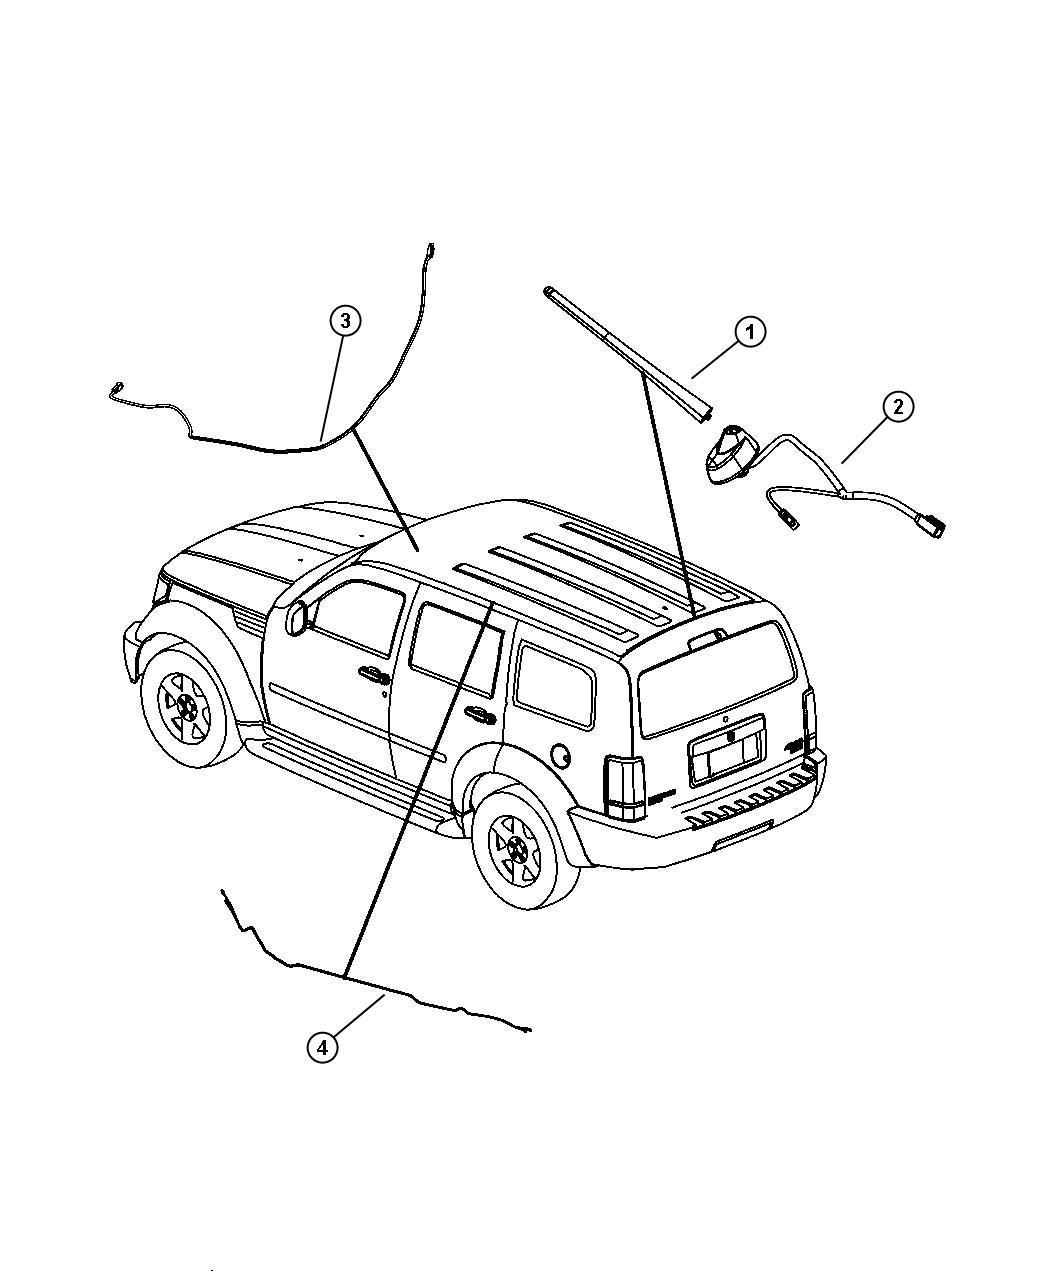 2008 Chrysler Sebring Mast. Antenna. [removable short mast